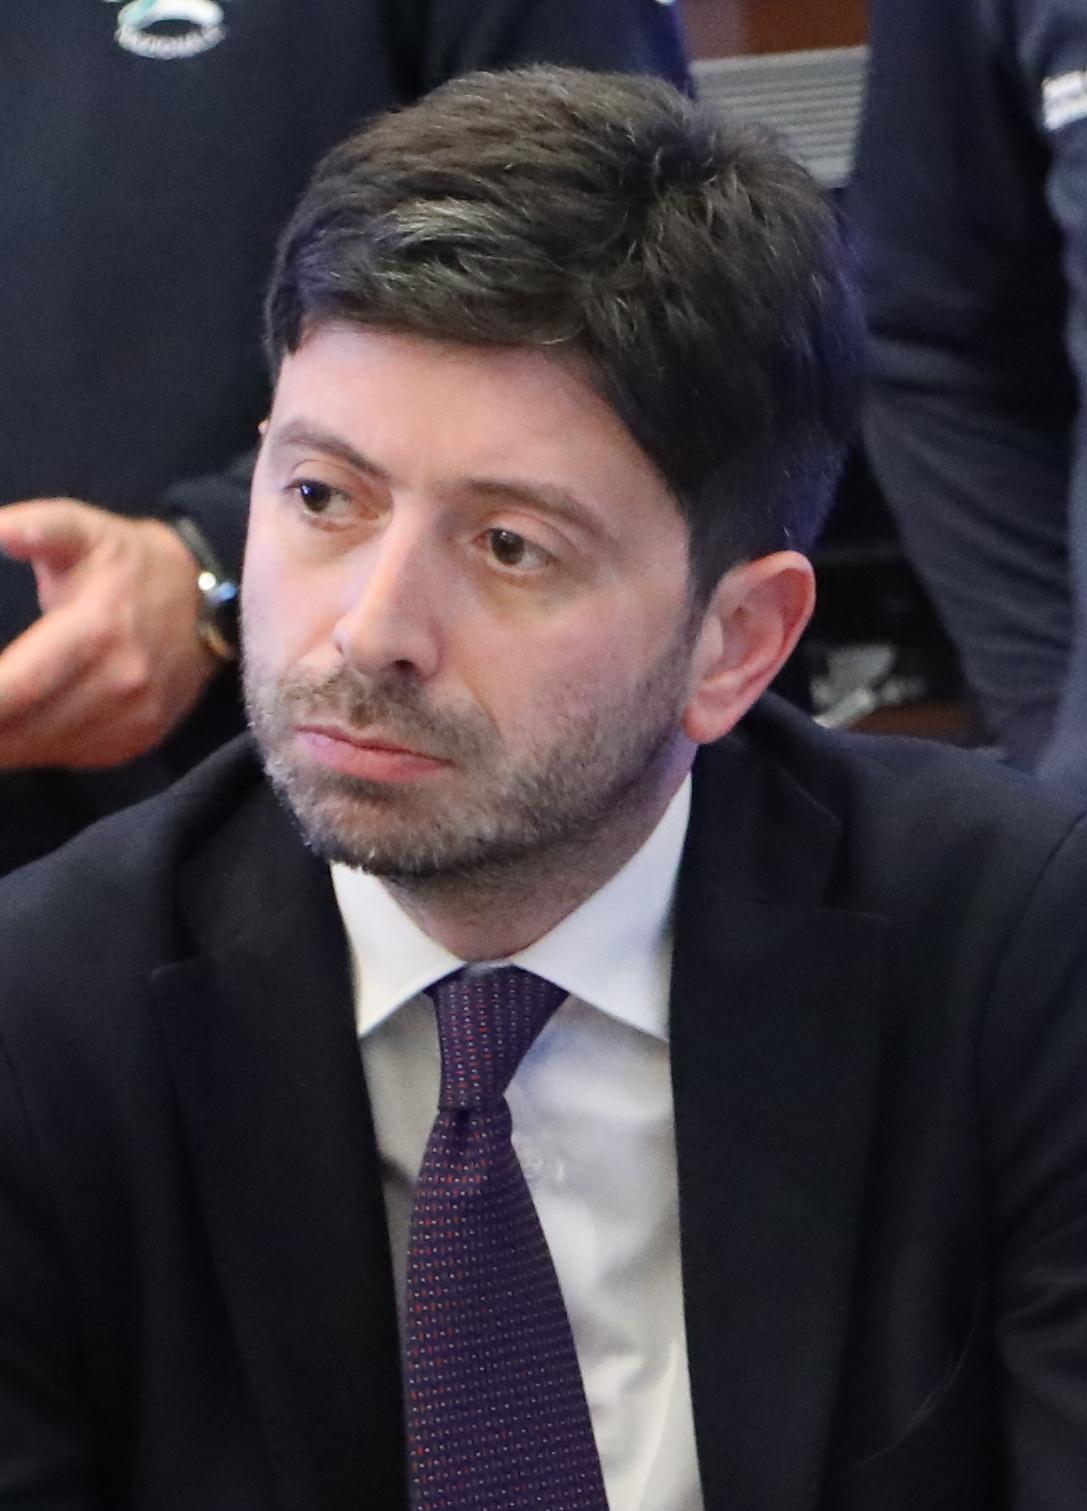 File:Roberto Speranza 2020 (cropped).jpg - Wikipedia